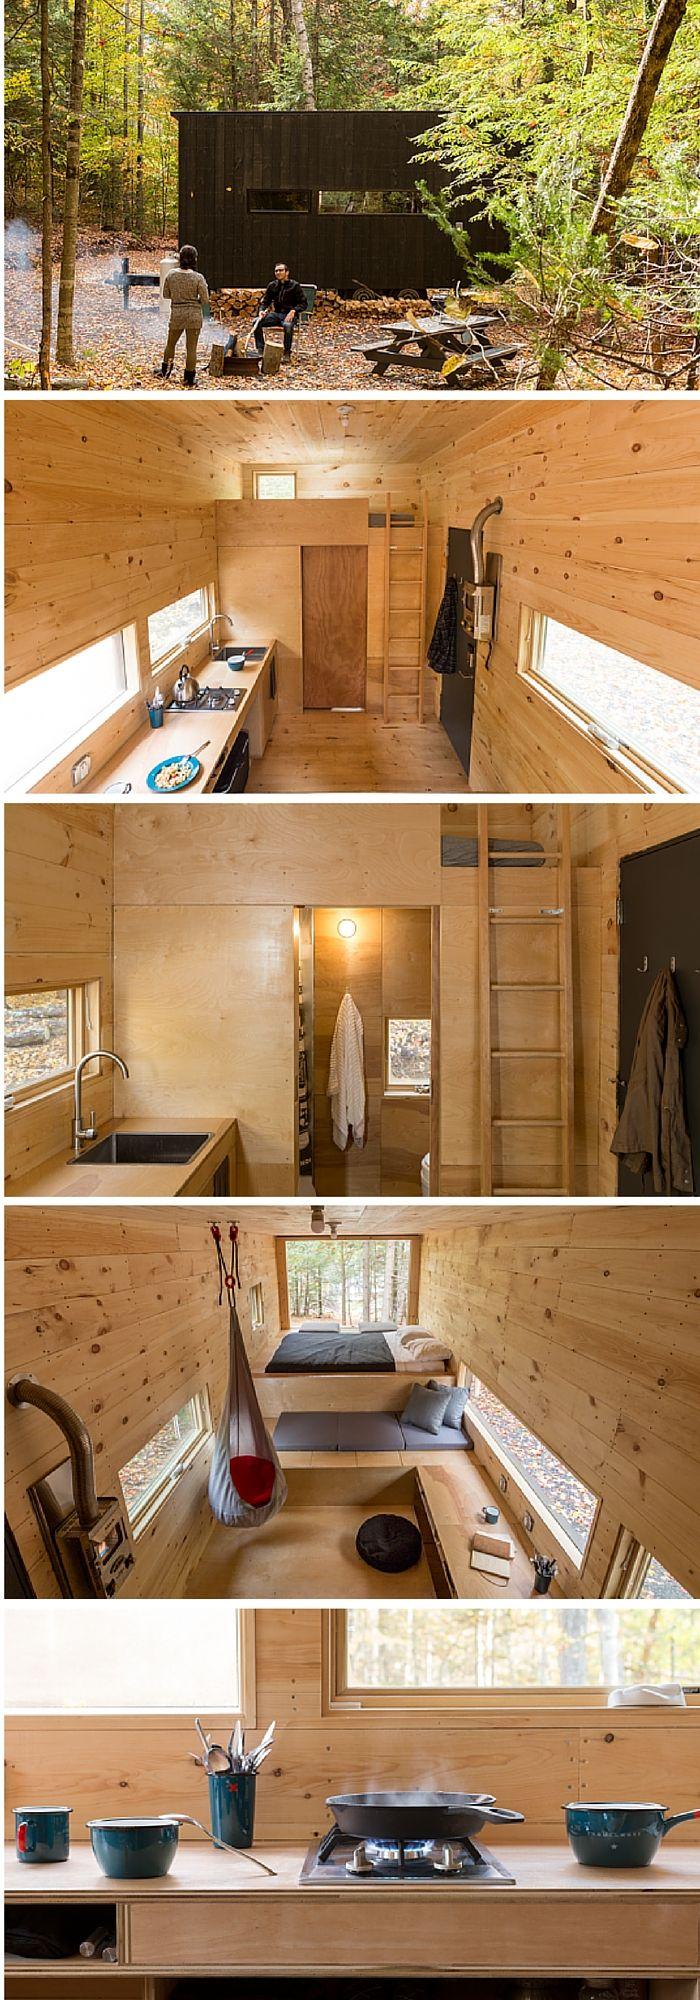 pin by igital arkets publishing on tiny home plans pinterest mini maison maison and. Black Bedroom Furniture Sets. Home Design Ideas